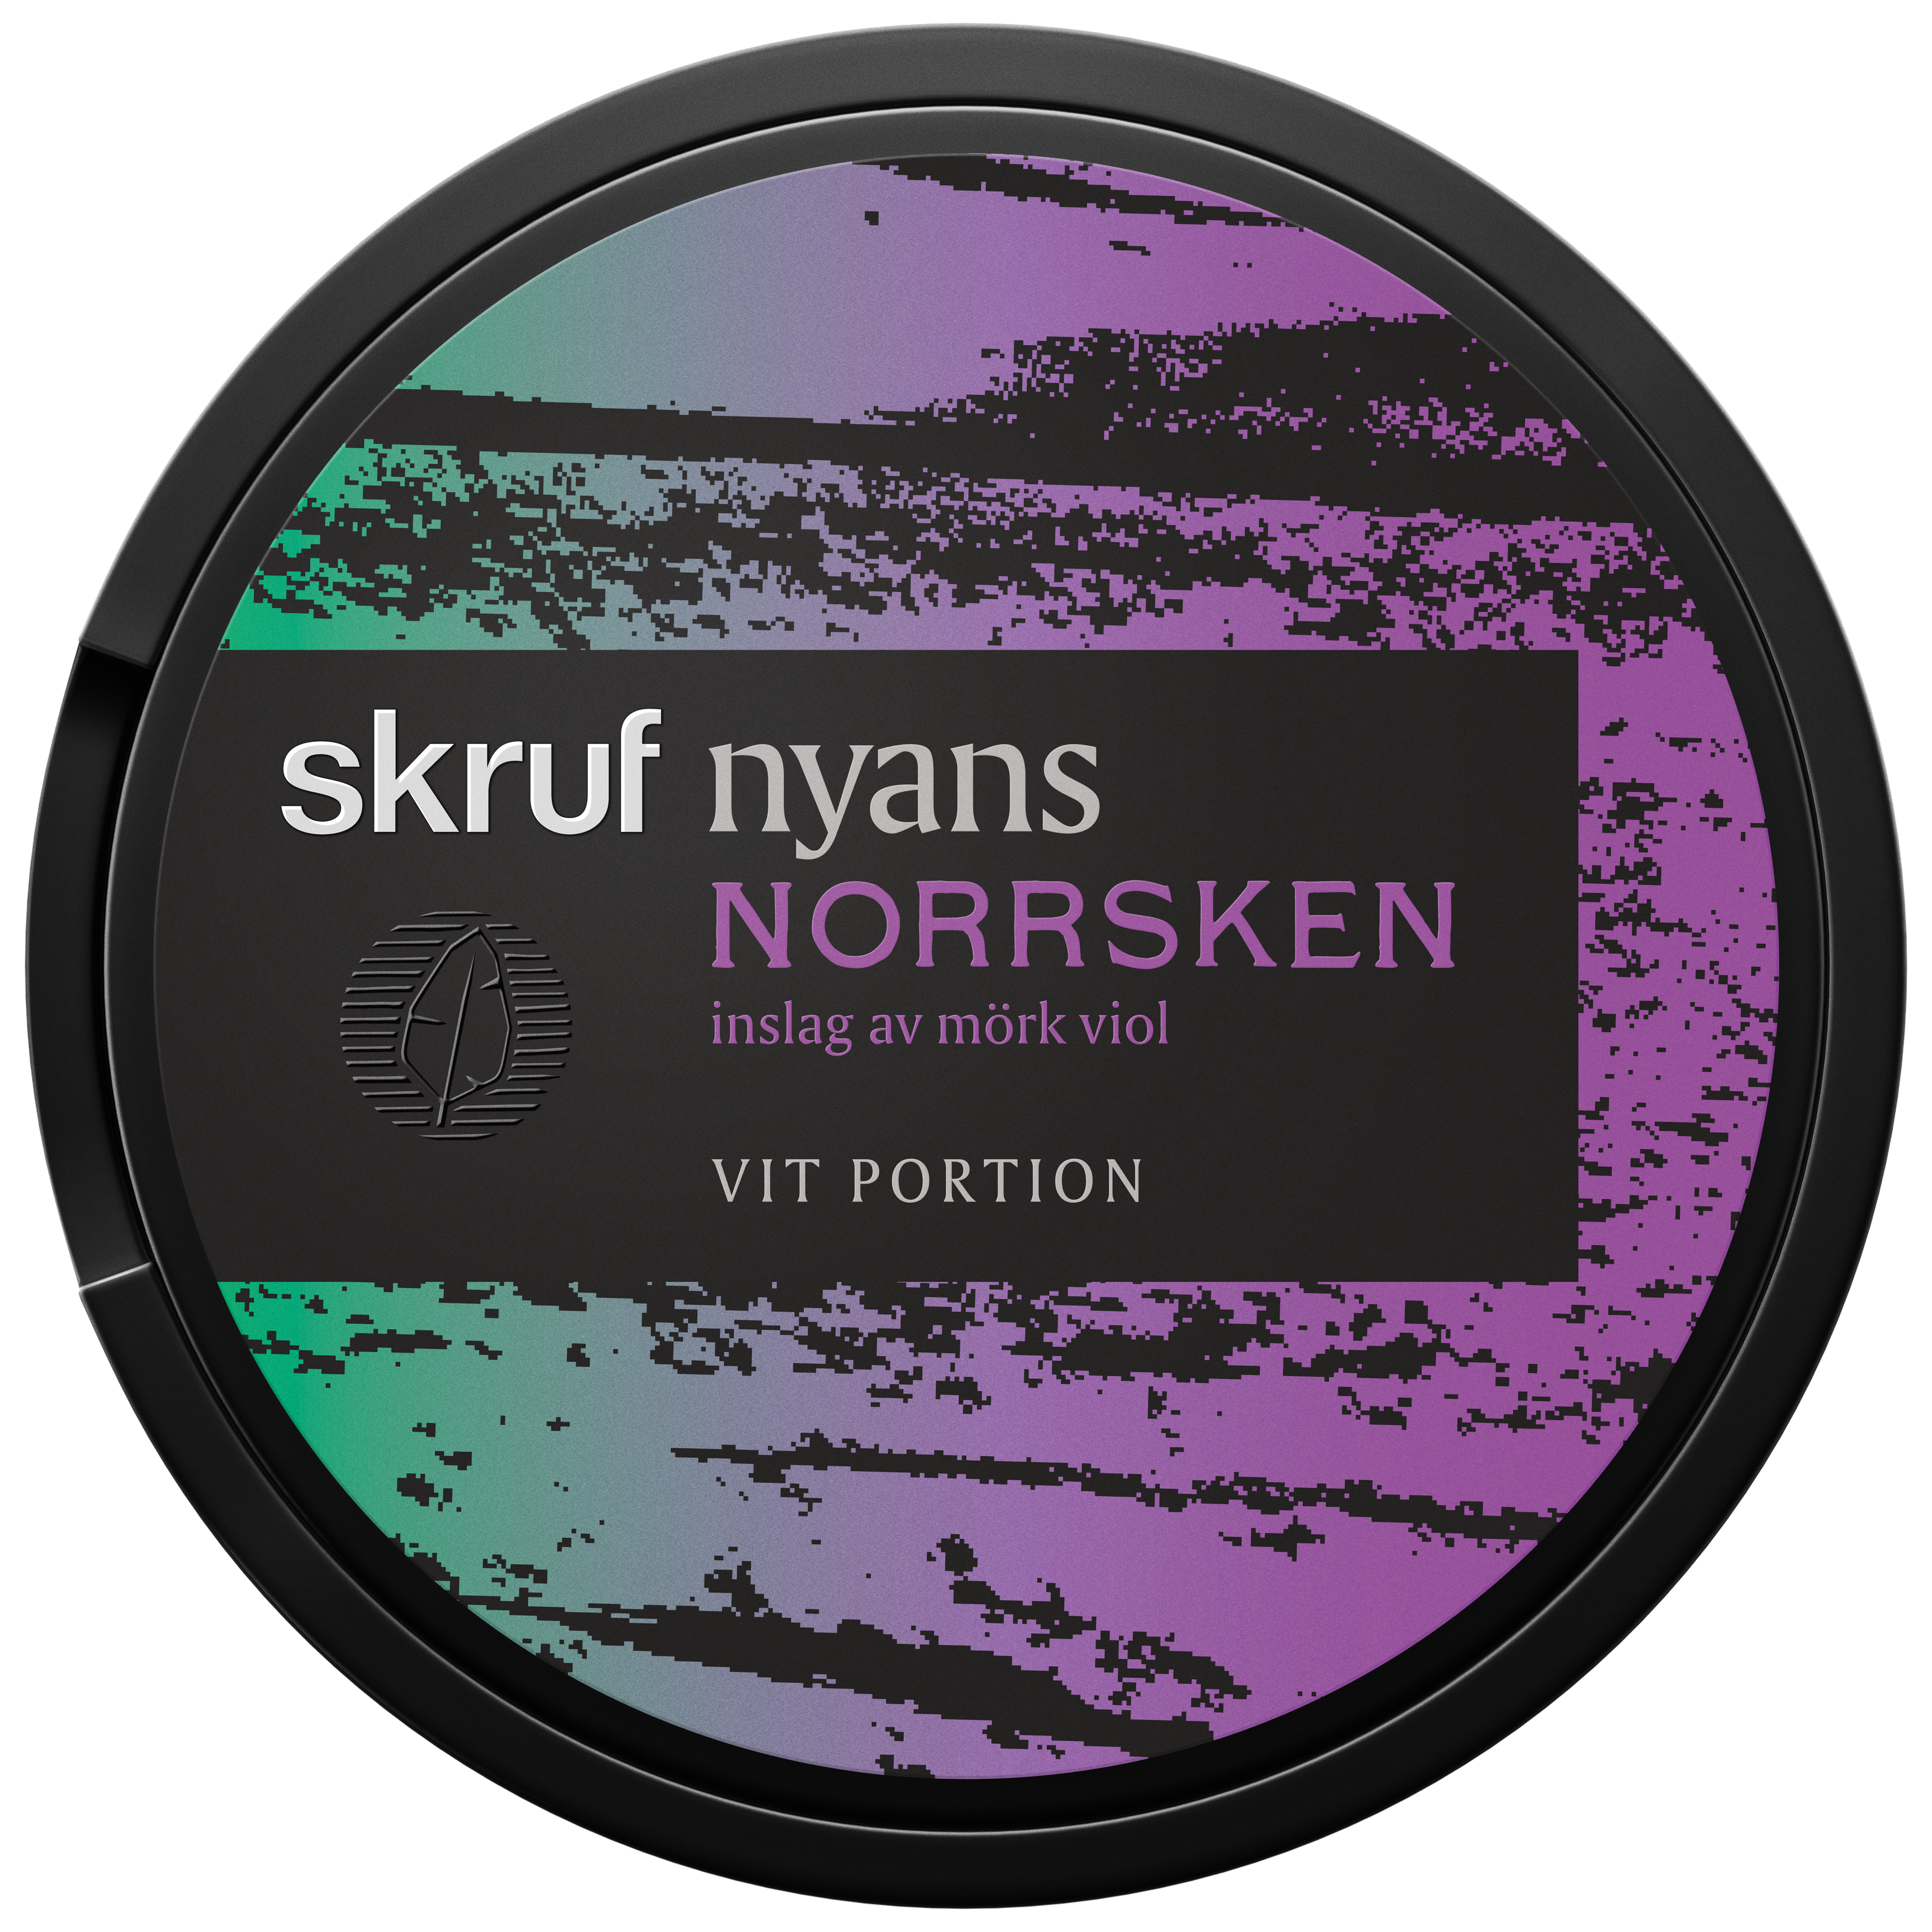 Skruf Nyans Norrsken har en smak av traditionell tobakssmak med inslag av viol och lakrits. Nyans Norrsken har normalstora white-portioner.